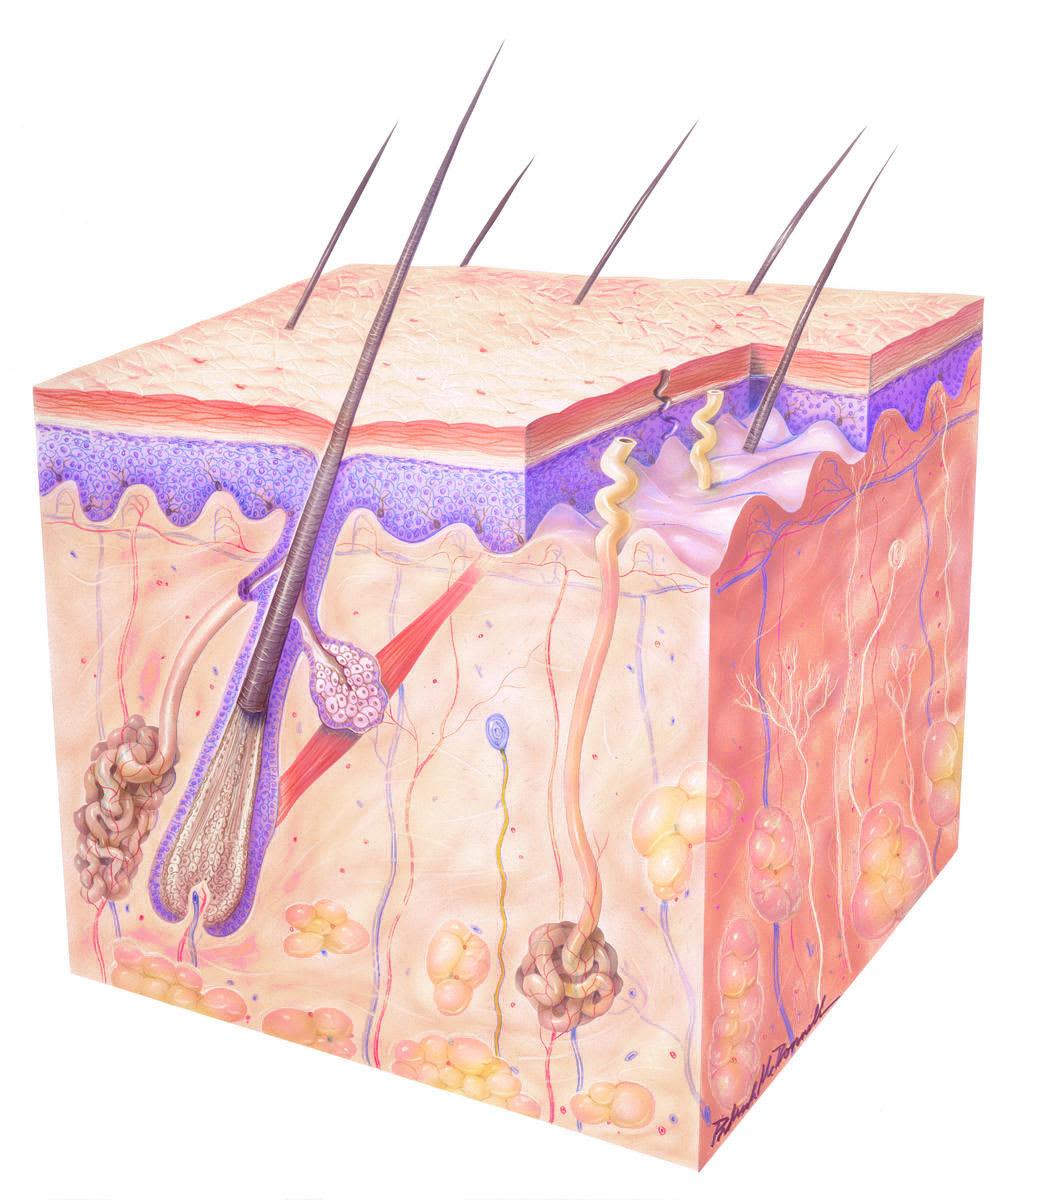 Dermatological Health